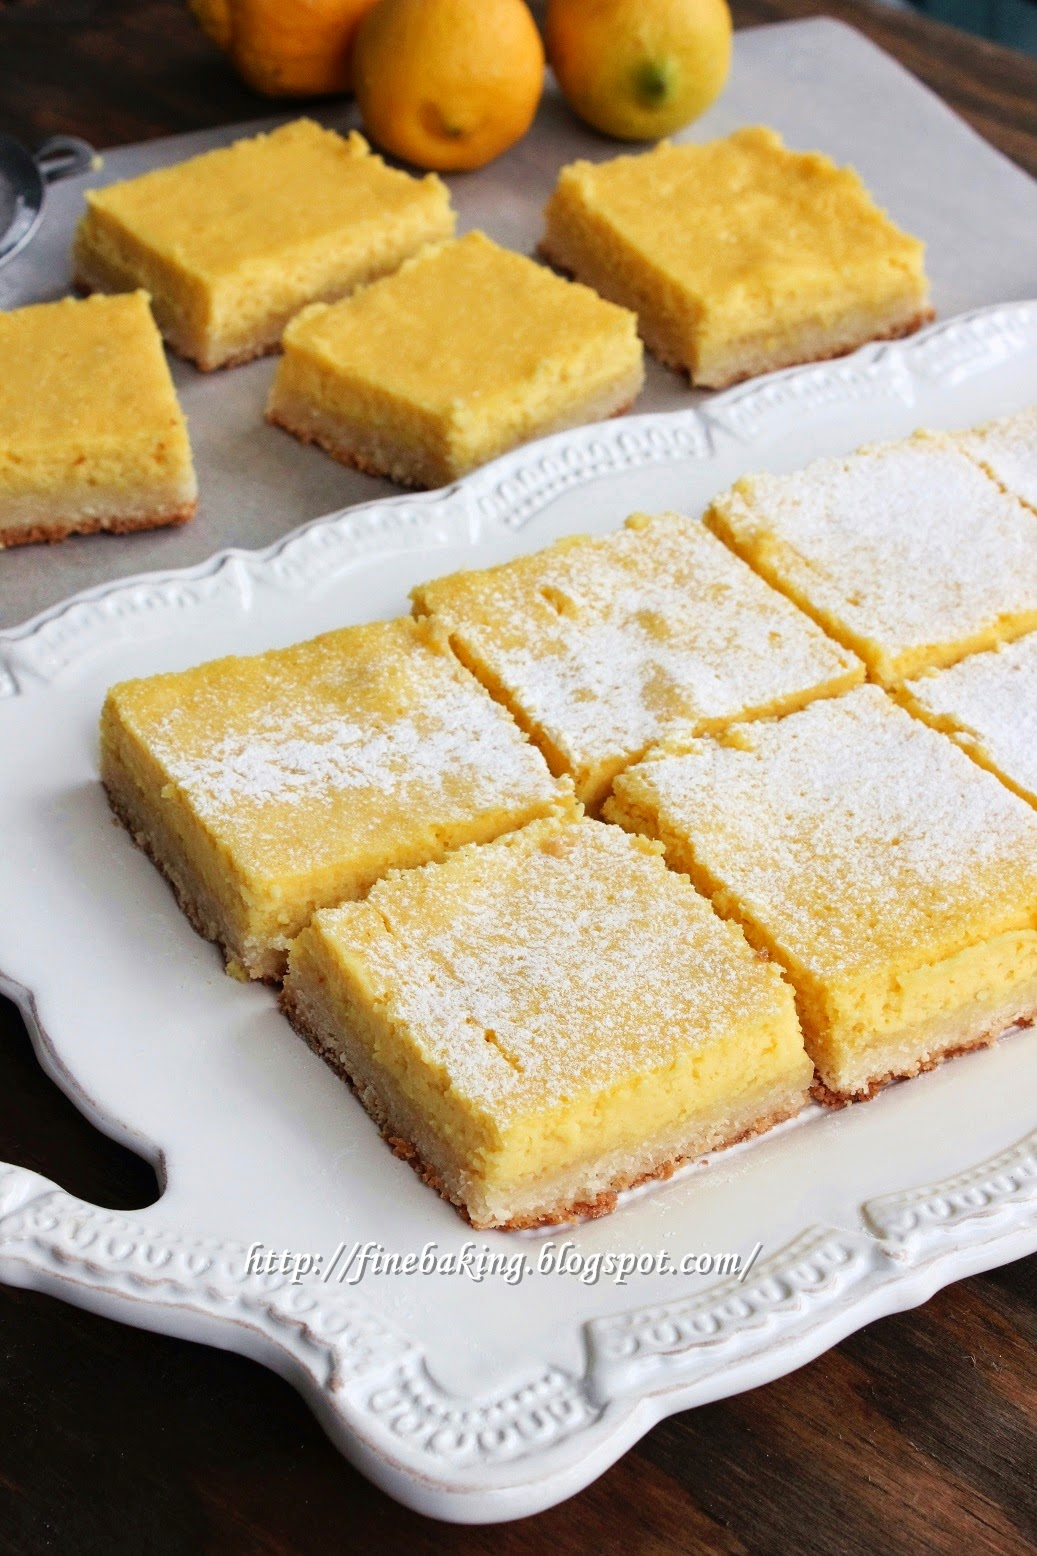 Golden Cloud Sponge Cake Recipe